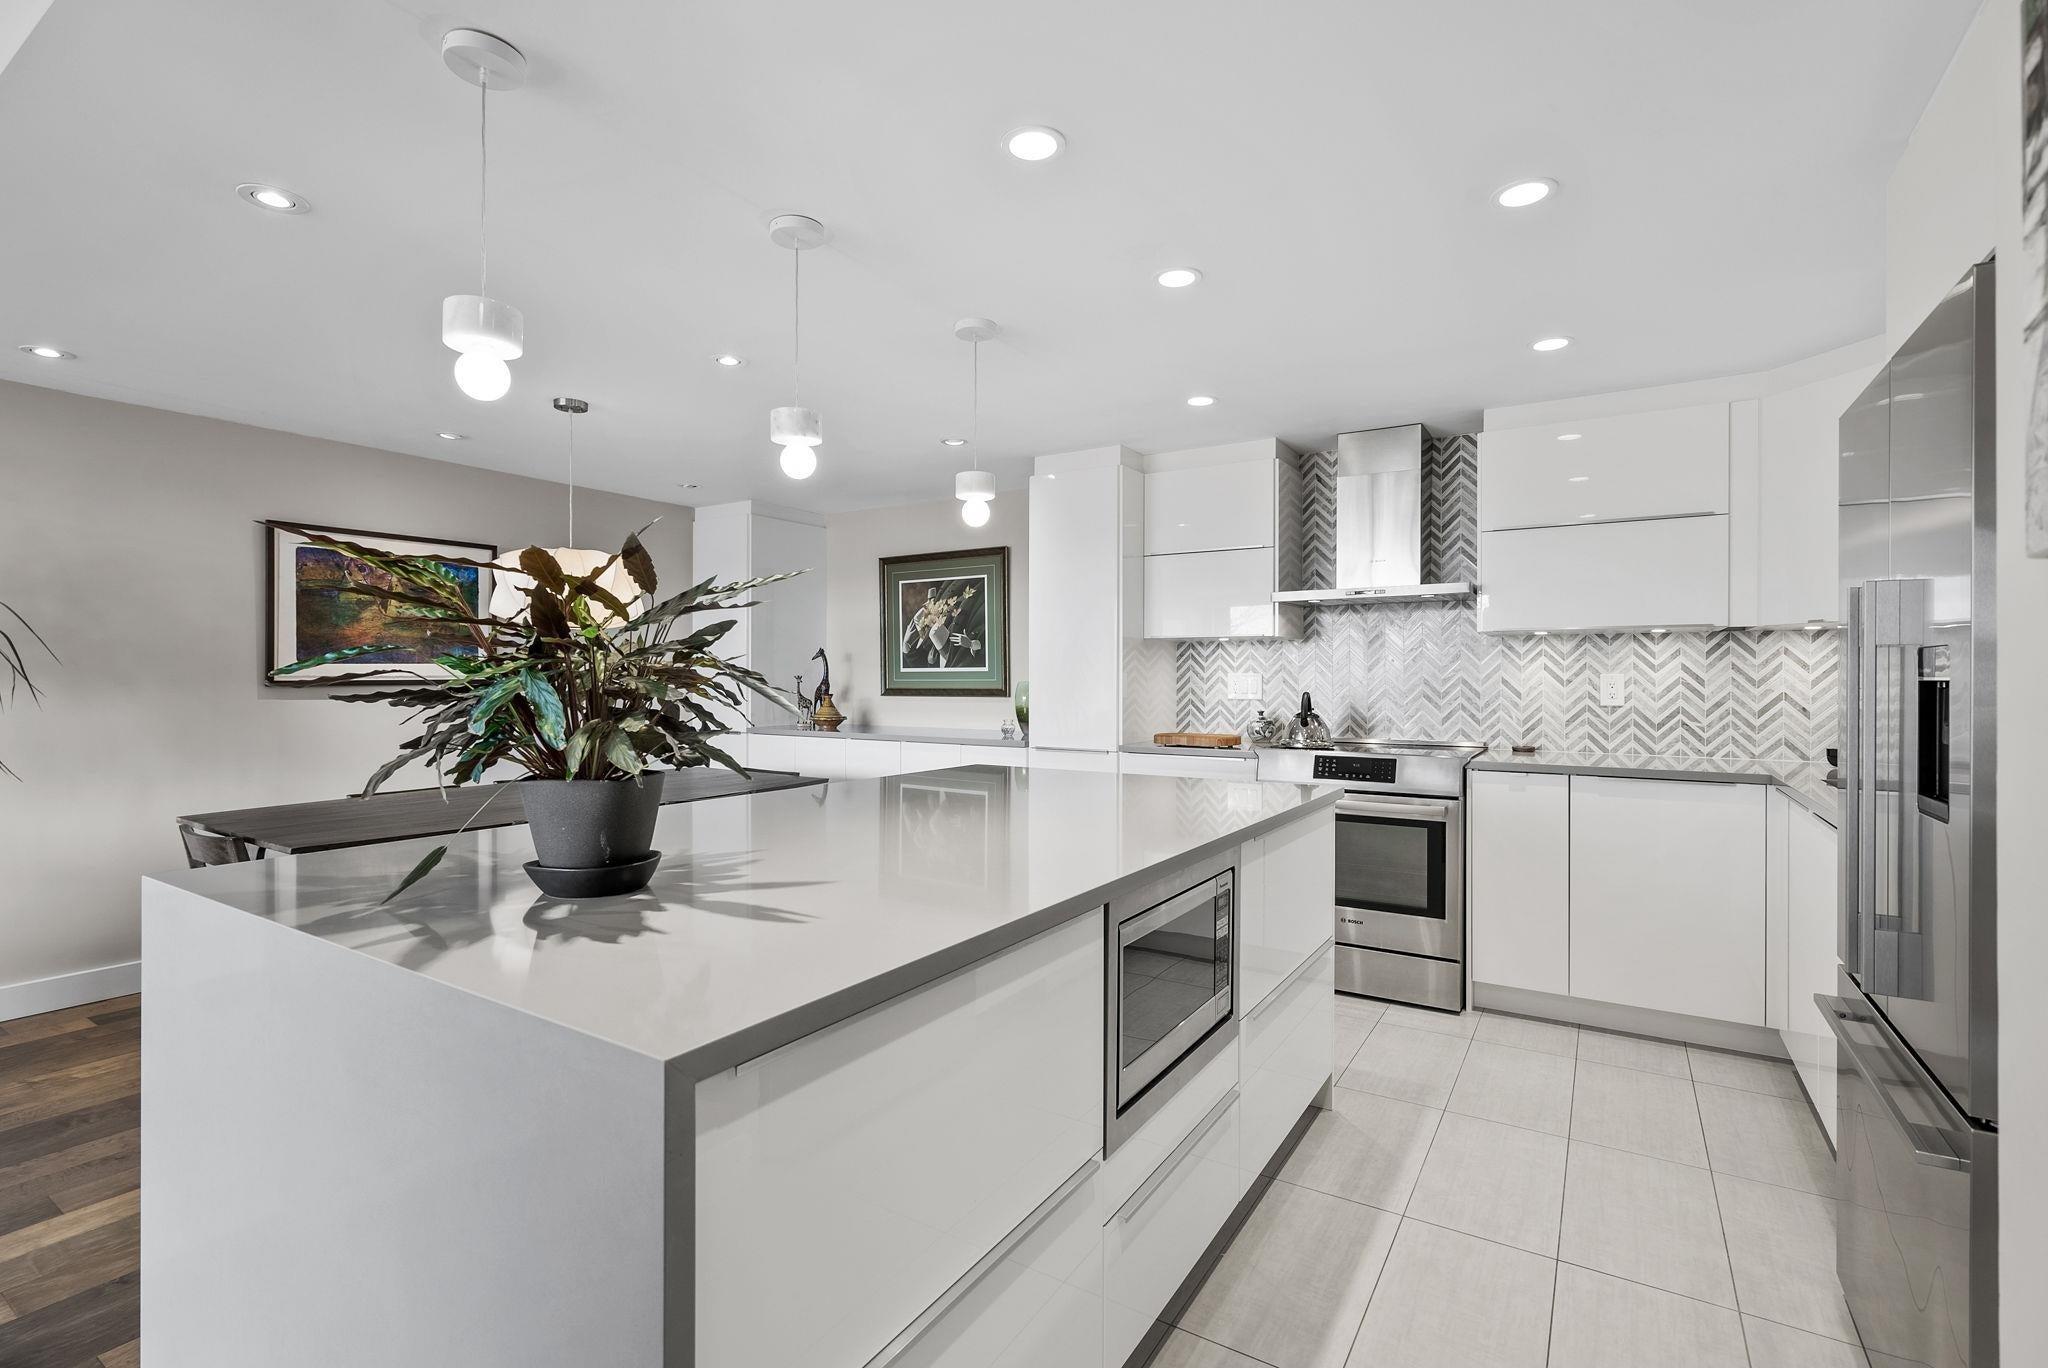 510 1490 PENNYFARTHING DRIVE - False Creek Apartment/Condo for sale, 2 Bedrooms (R2618903) - #1